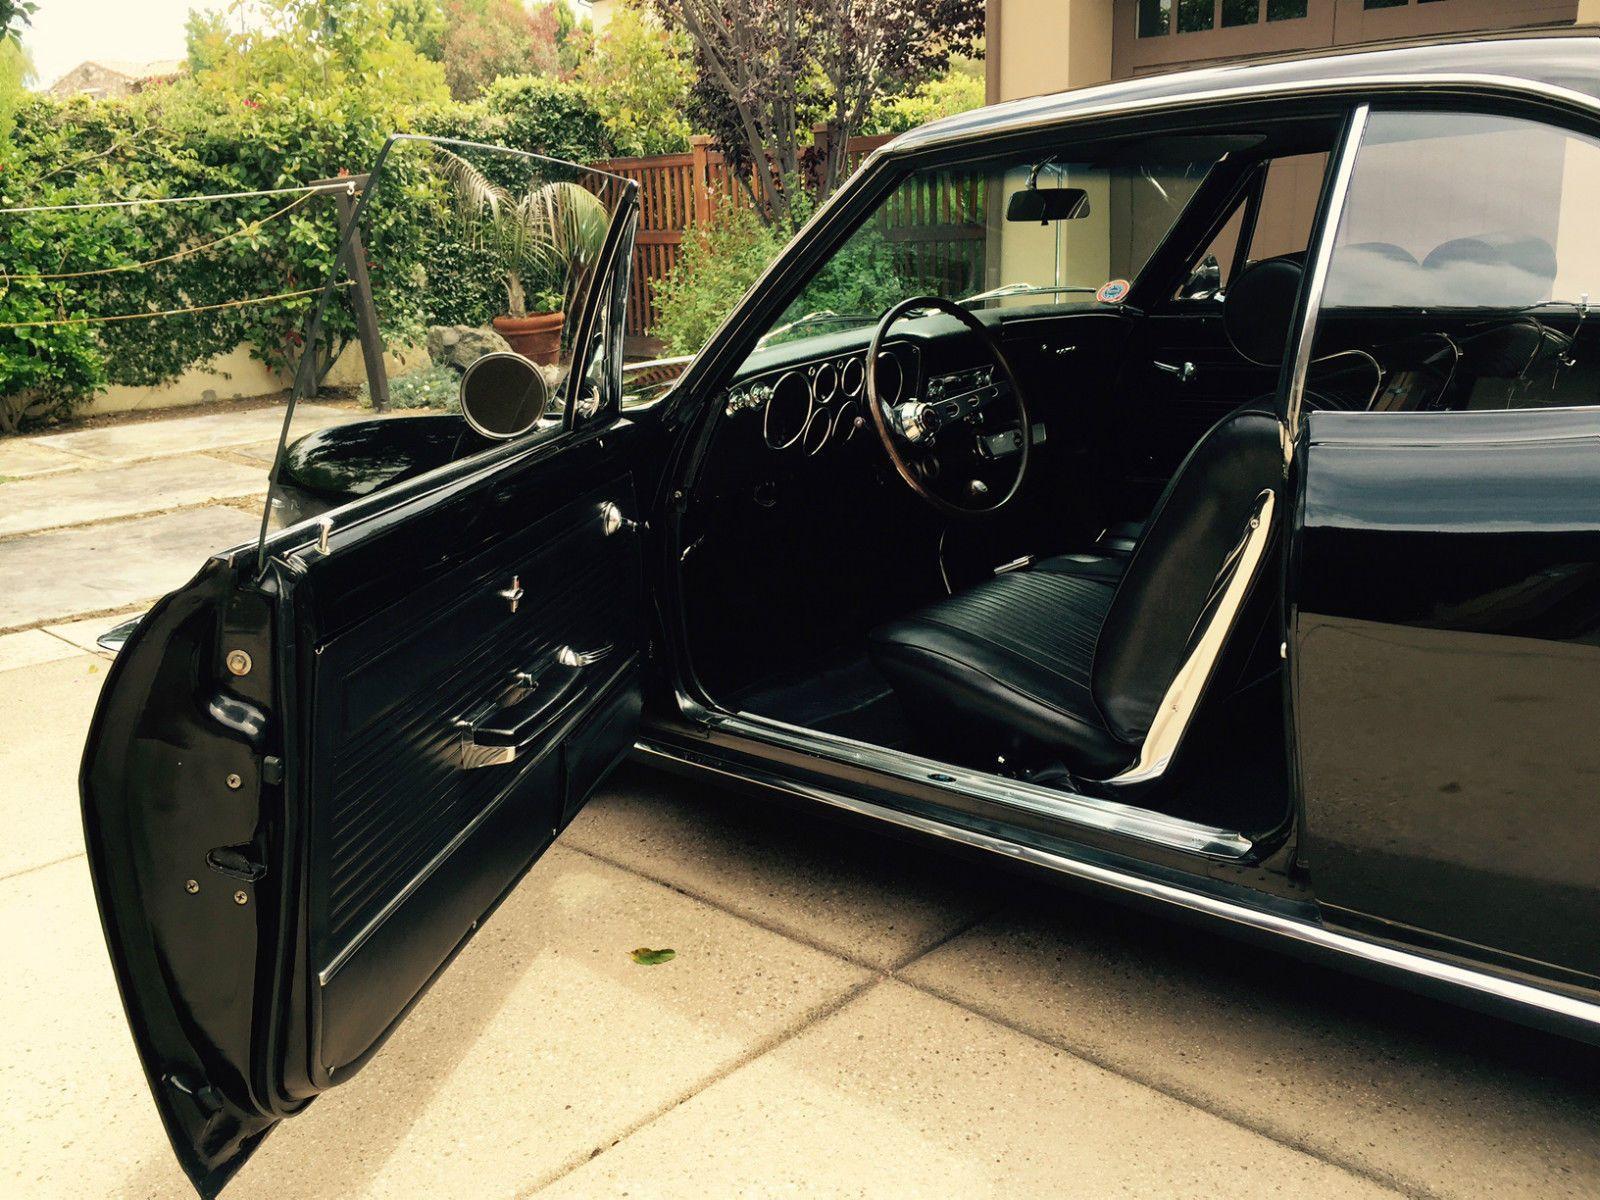 US $18,500.00 Used in eBay Motors, Cars & Trucks, Chevrolet   cool ...